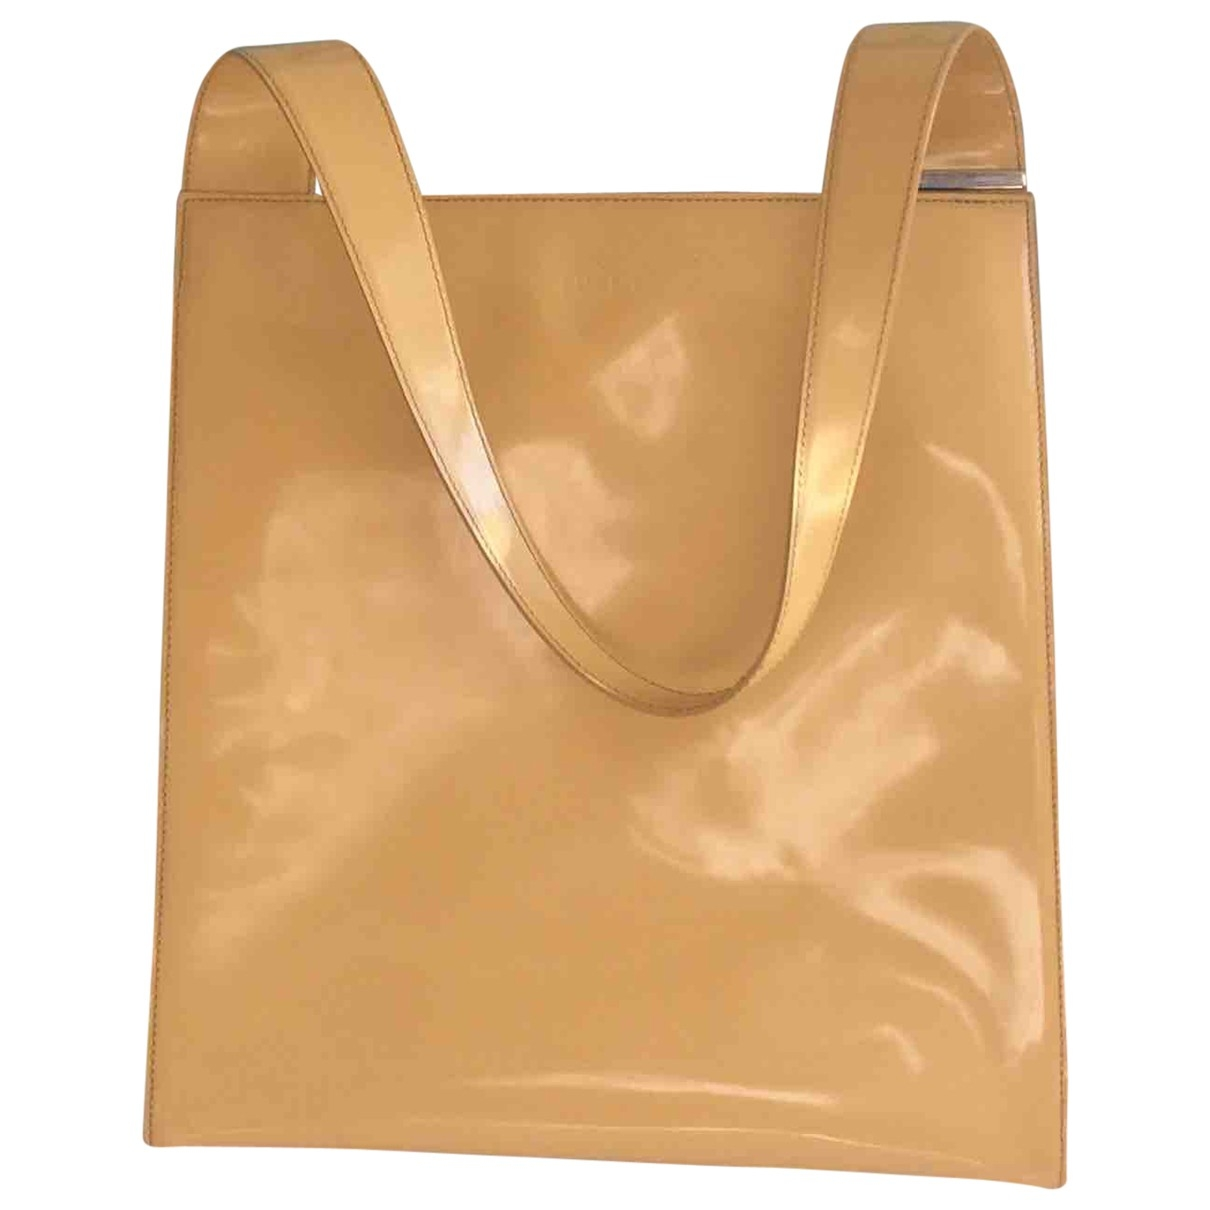 Furla \N Yellow Patent leather handbag for Women \N